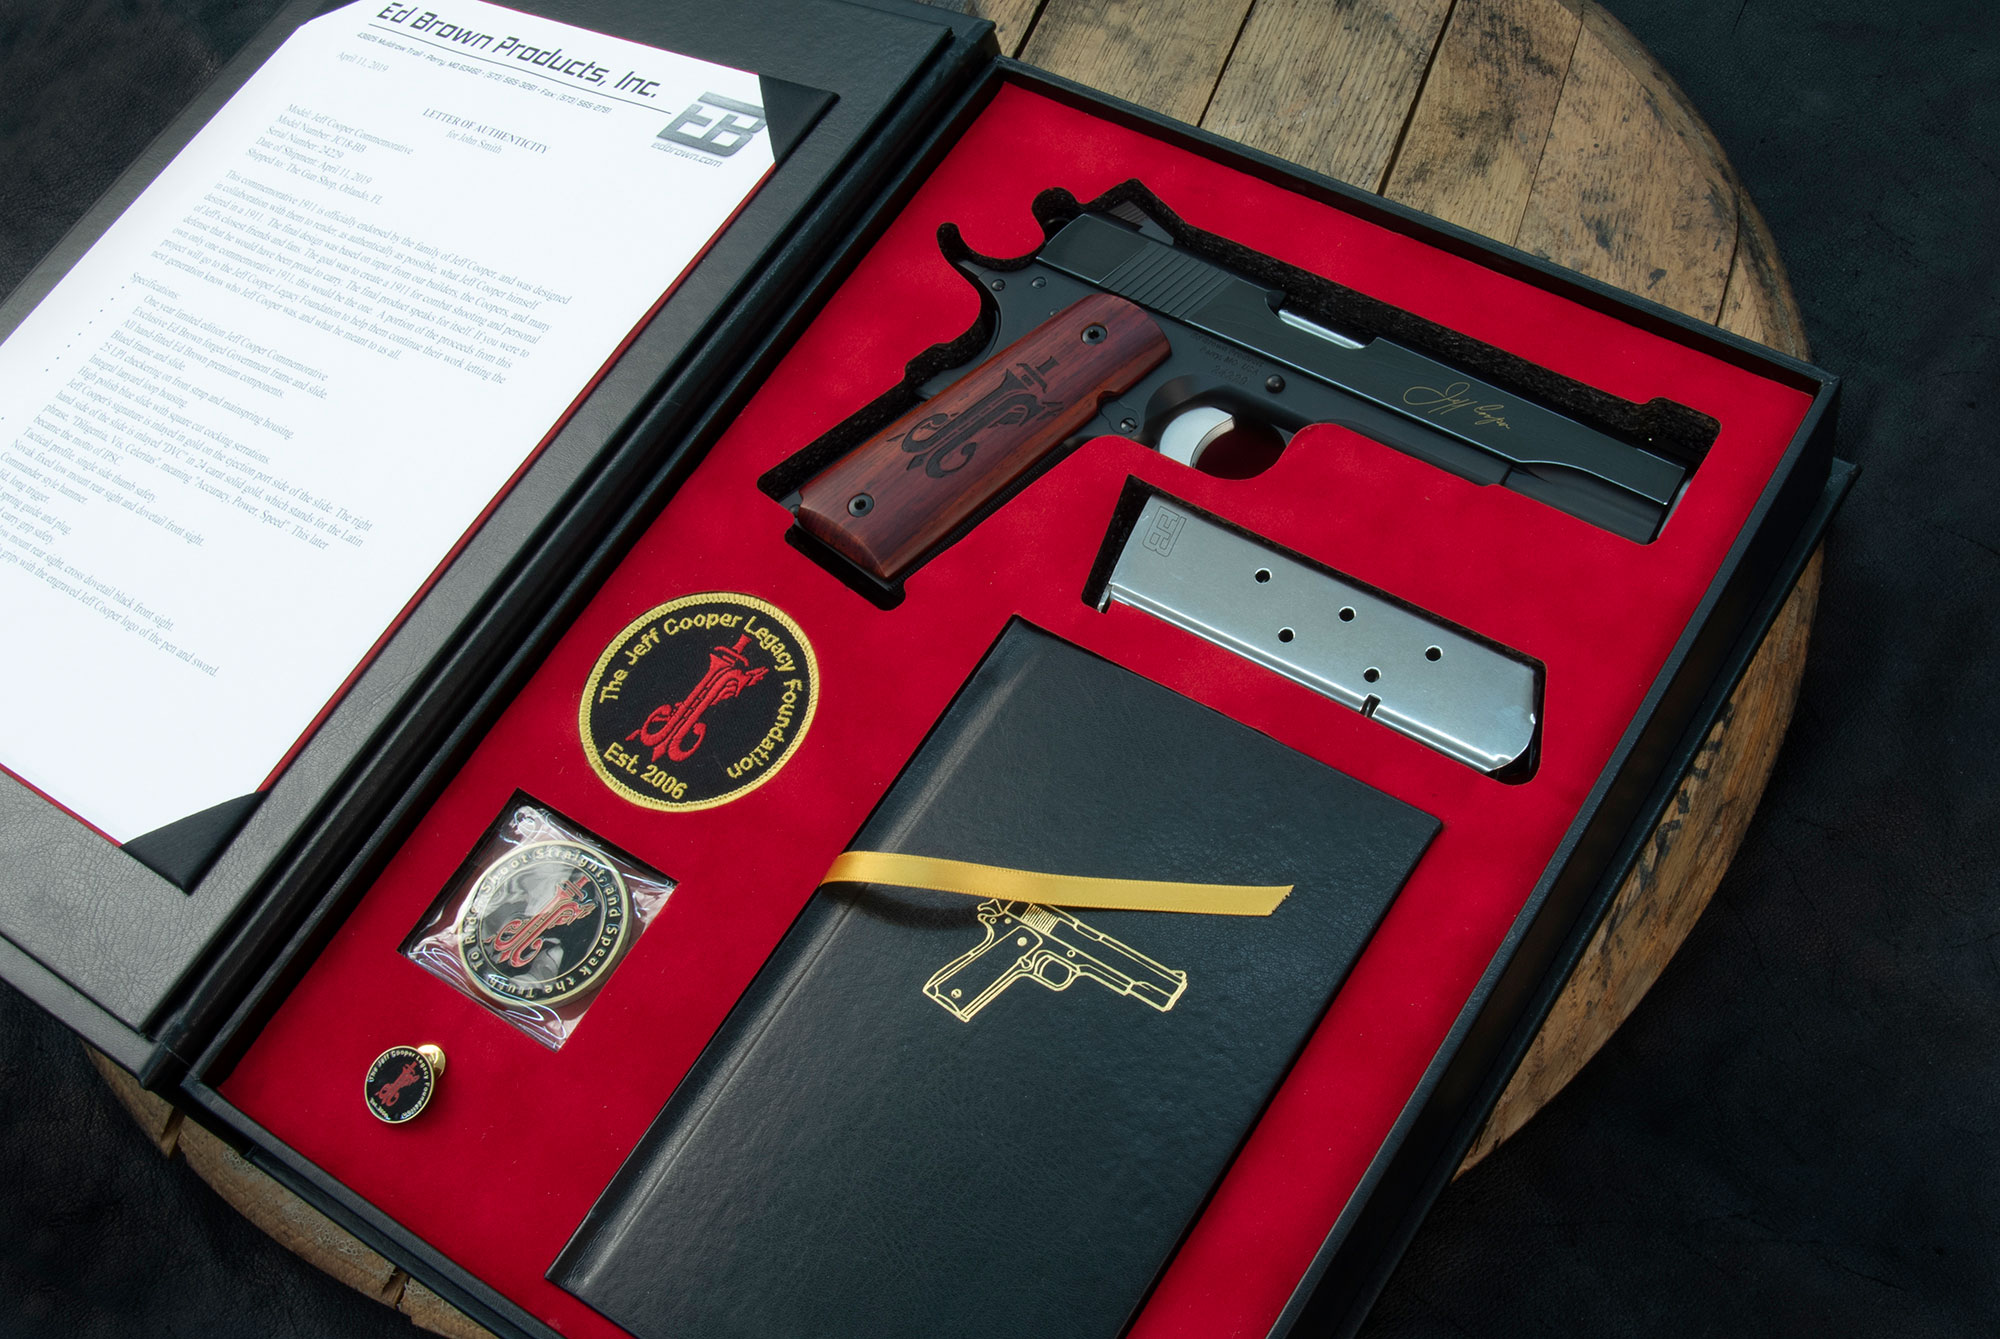 Jeff Cooper 1911 in case